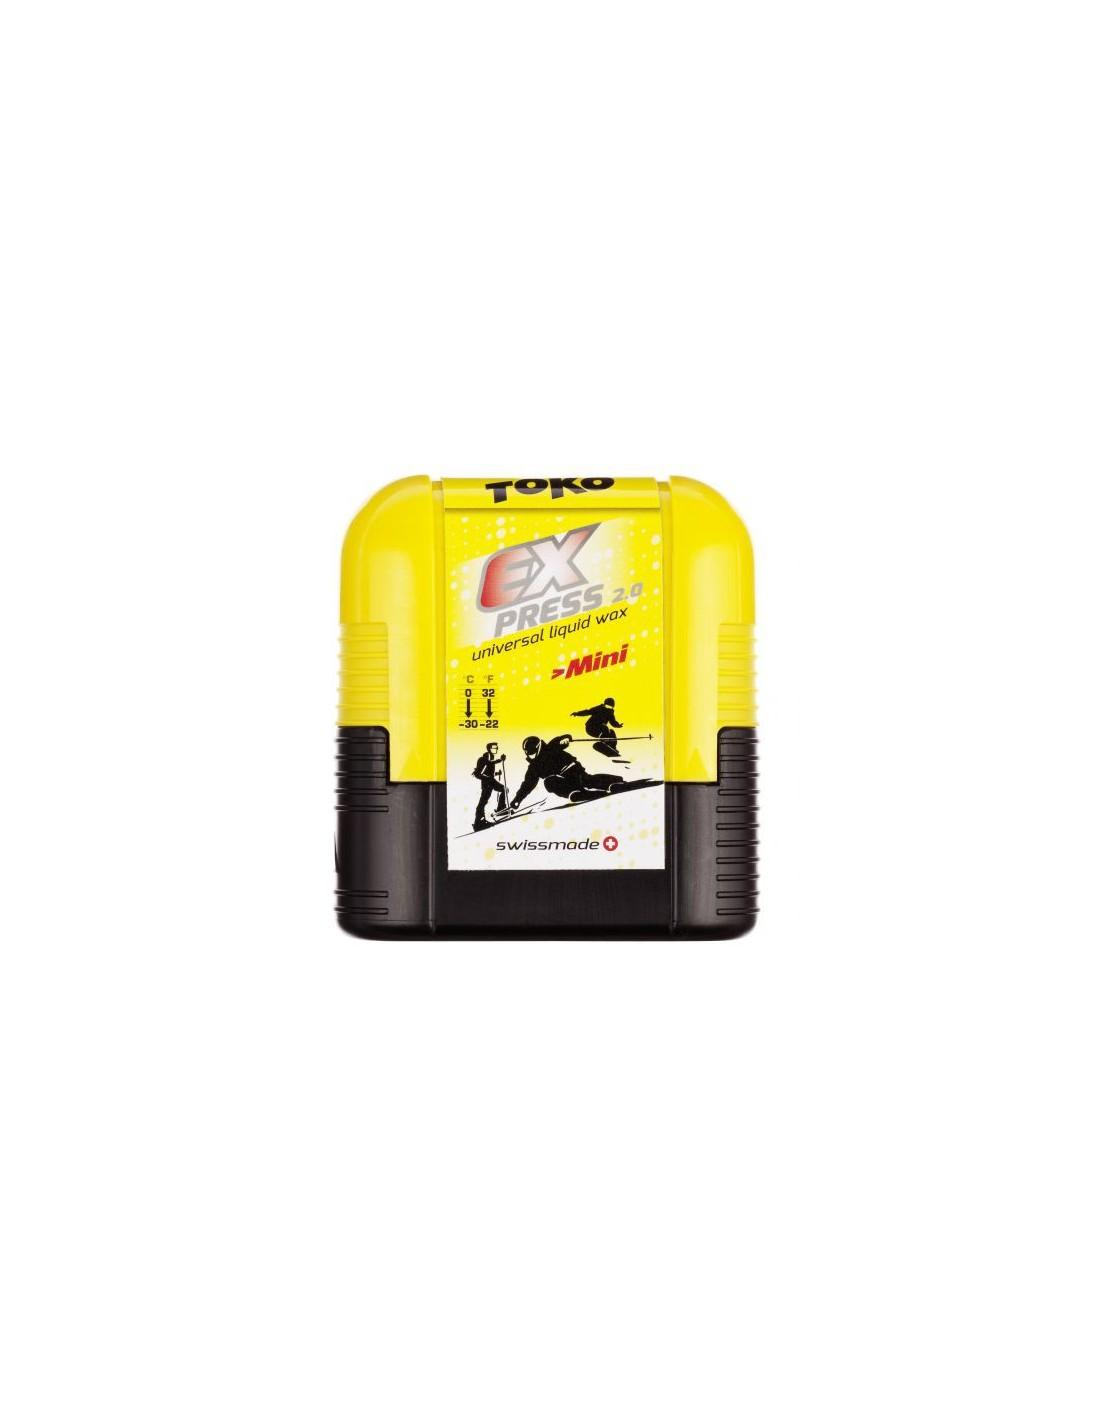 Toko Express Mini 75ml Wachsart - Flüssigwachs, Wachs Toko - Universalwachs, Wa